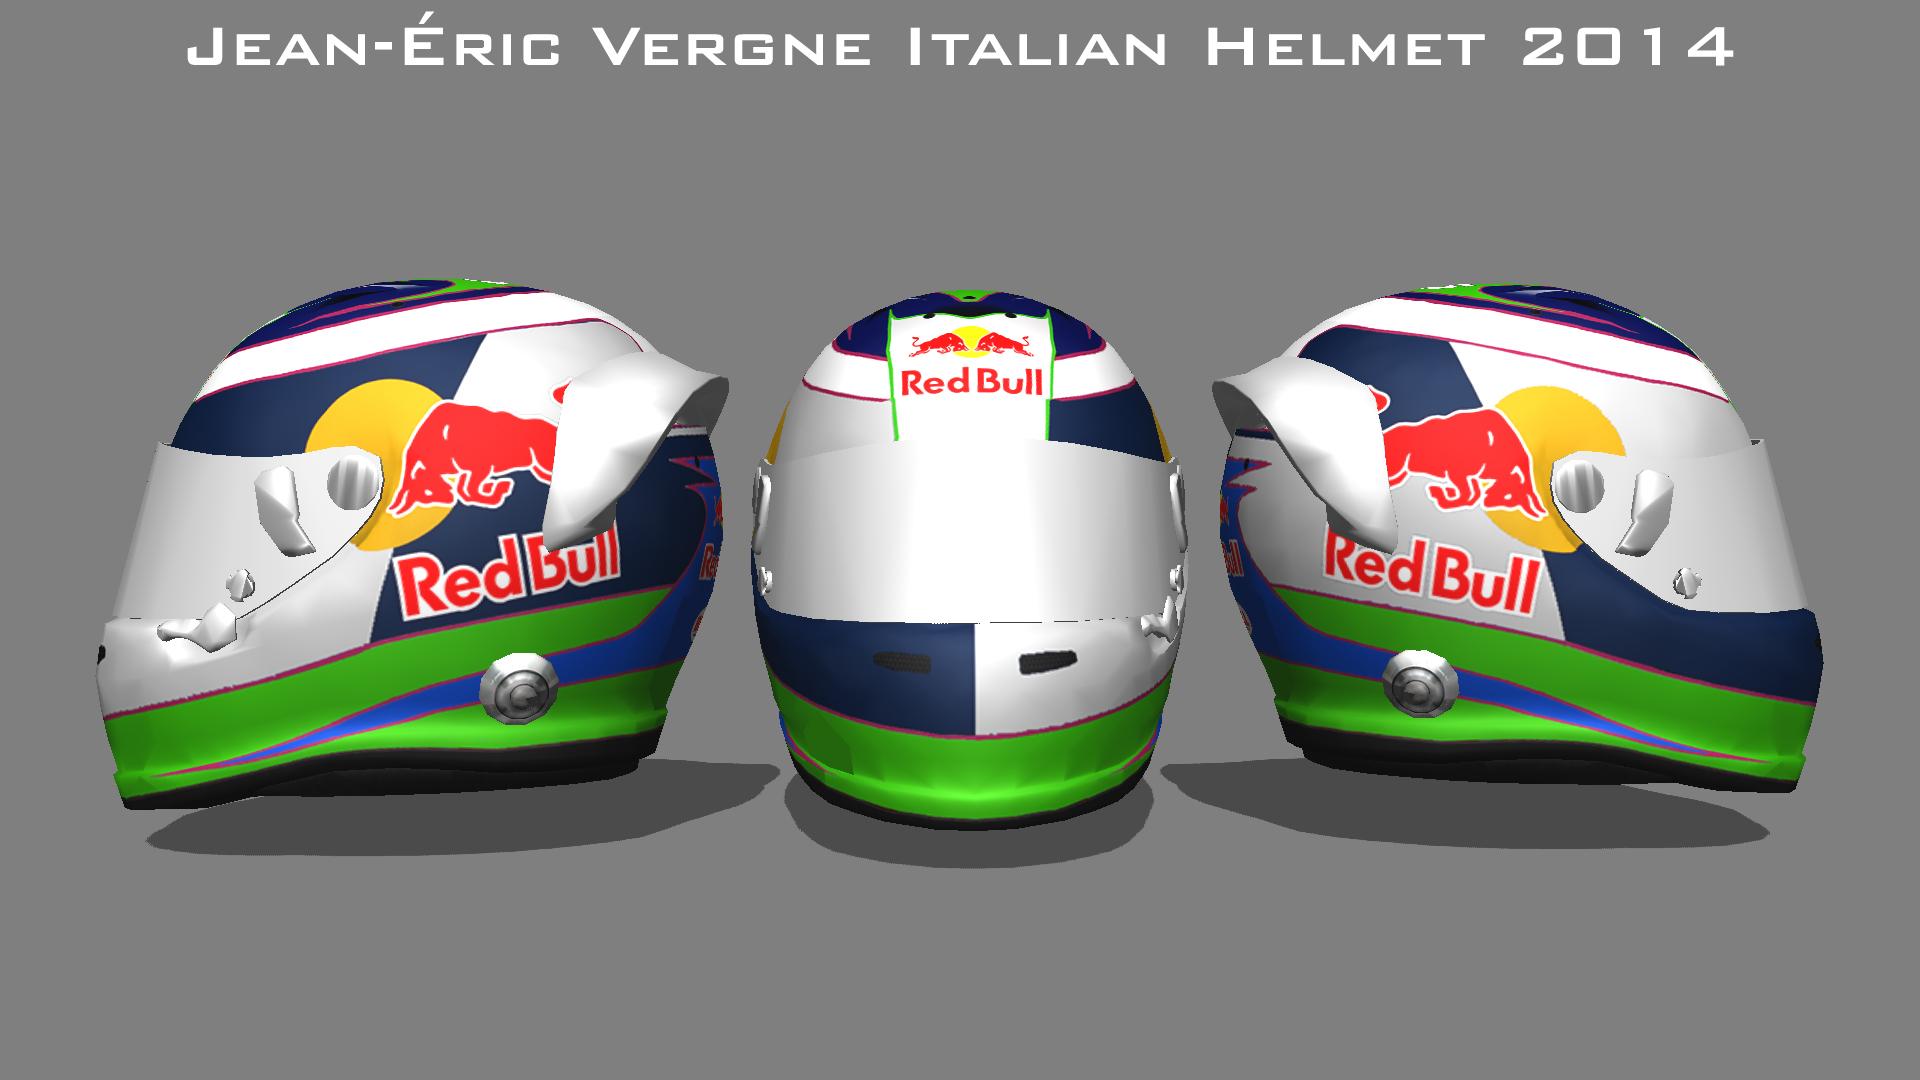 Jean-Éric Vergne Italian Helmet 2014.jpg